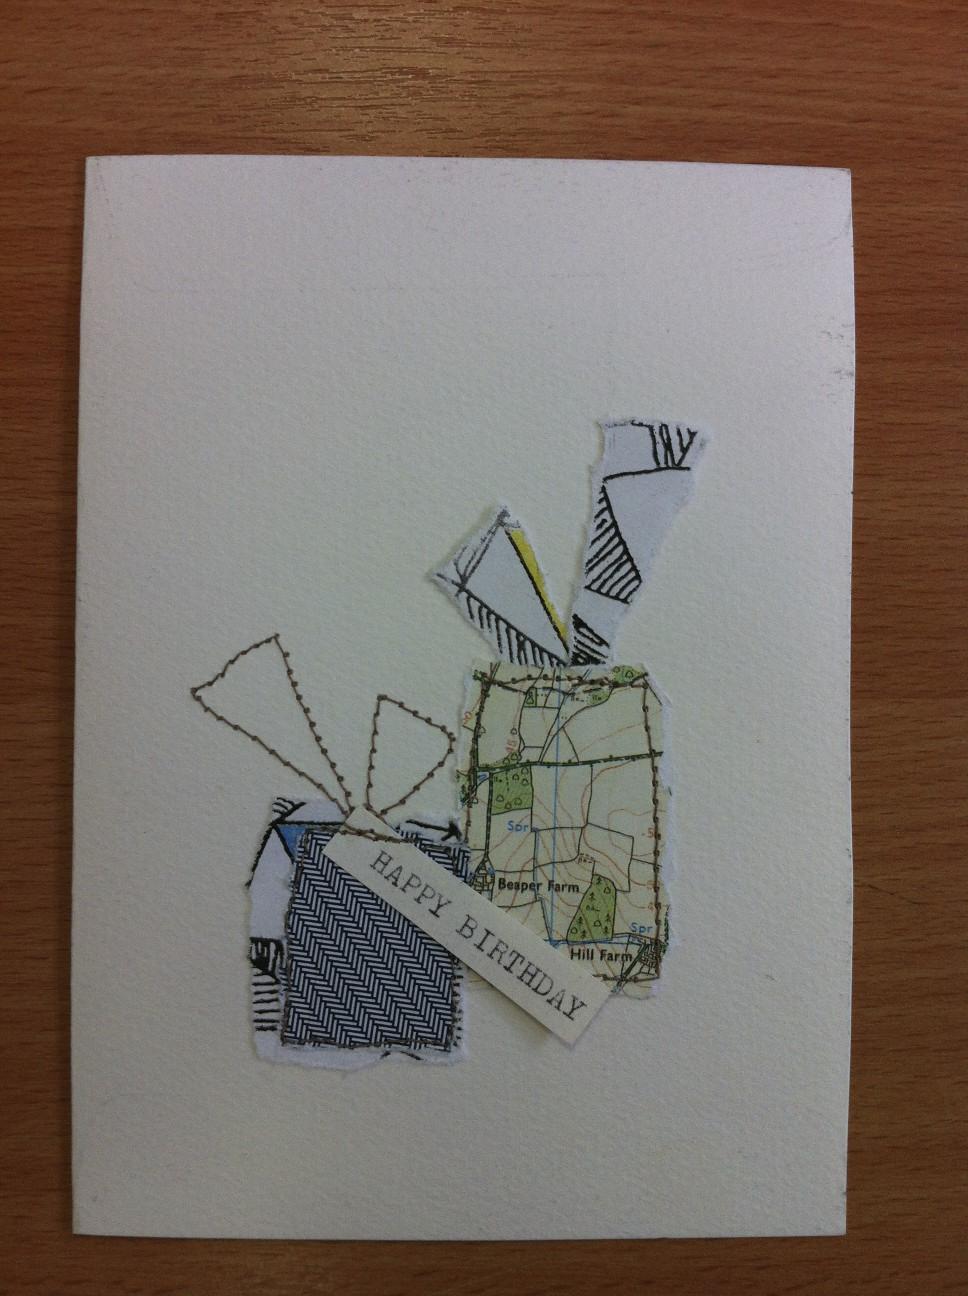 9Birthday_Card_personalised_bespoke_design_and _message.jpg